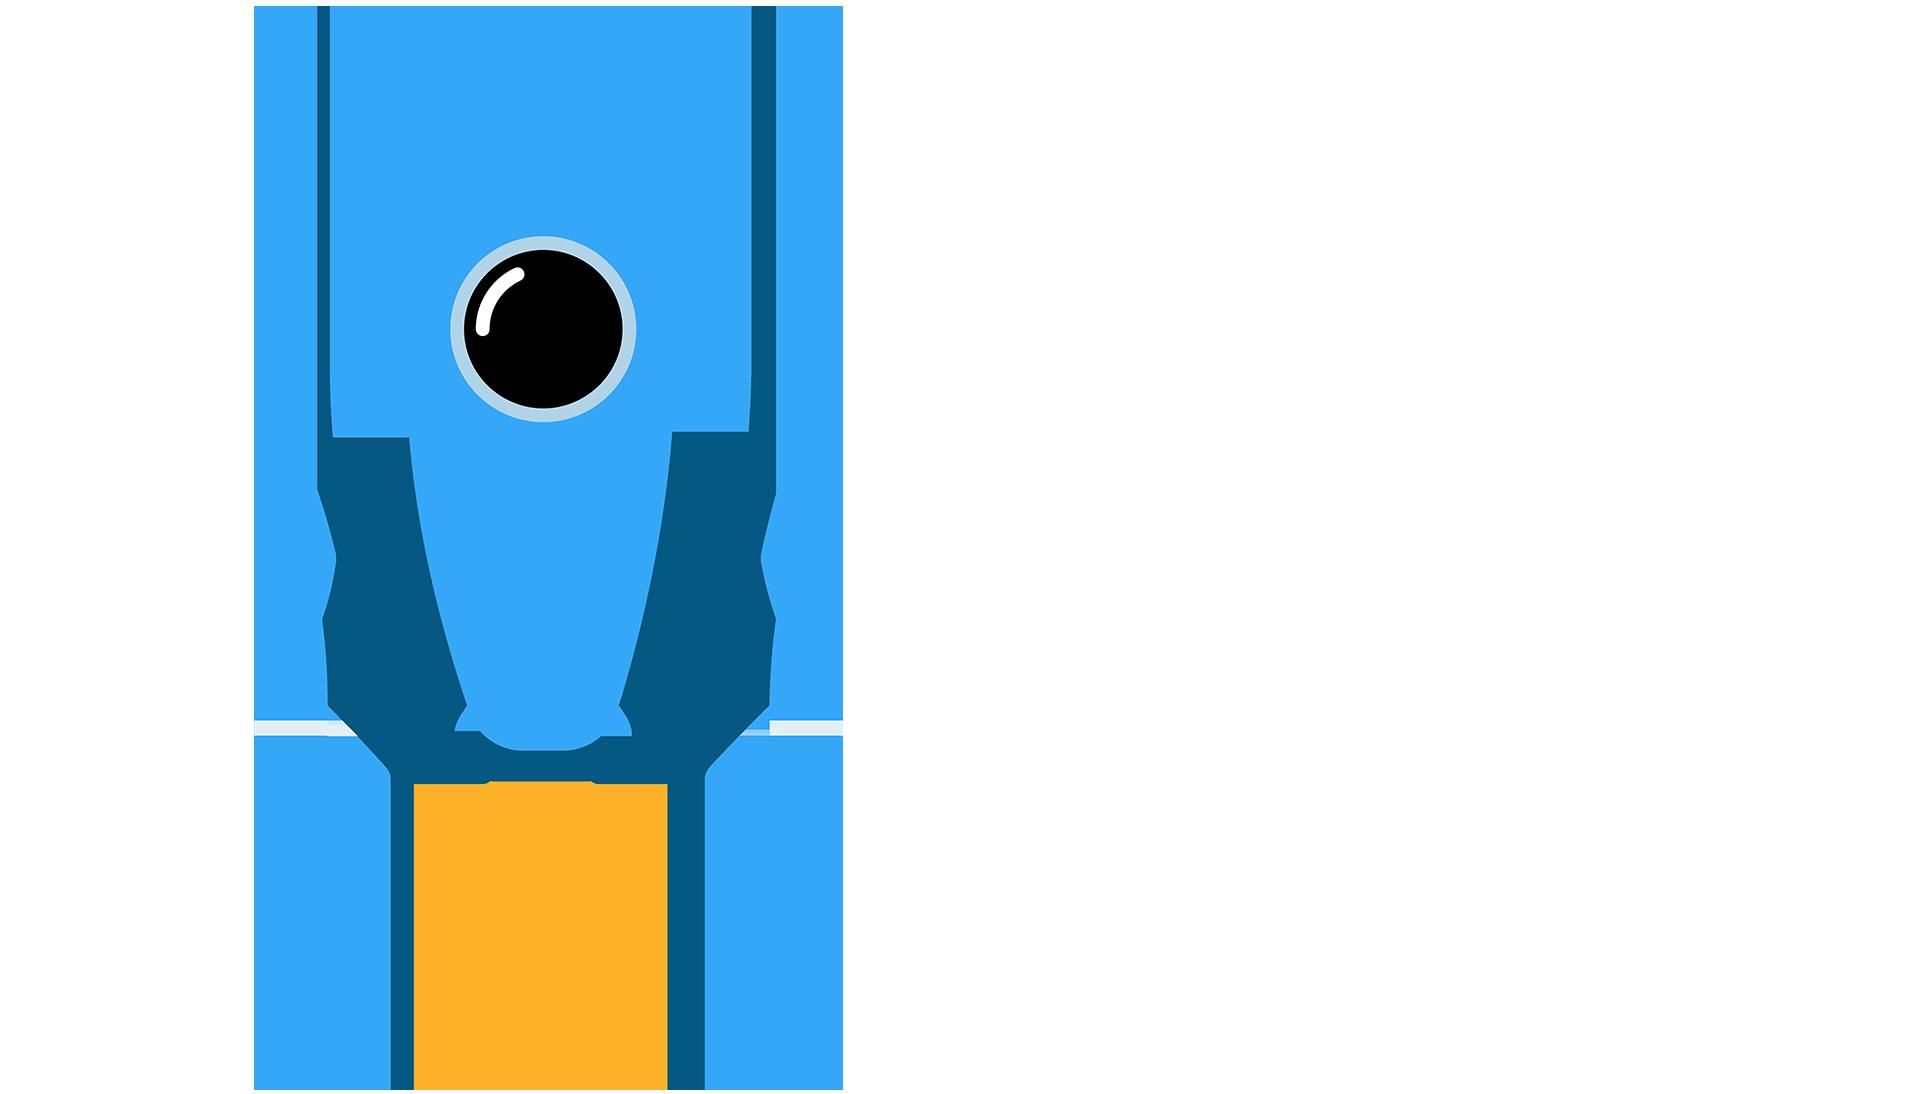 Clipart rocket adobe illustrator. Space on behance